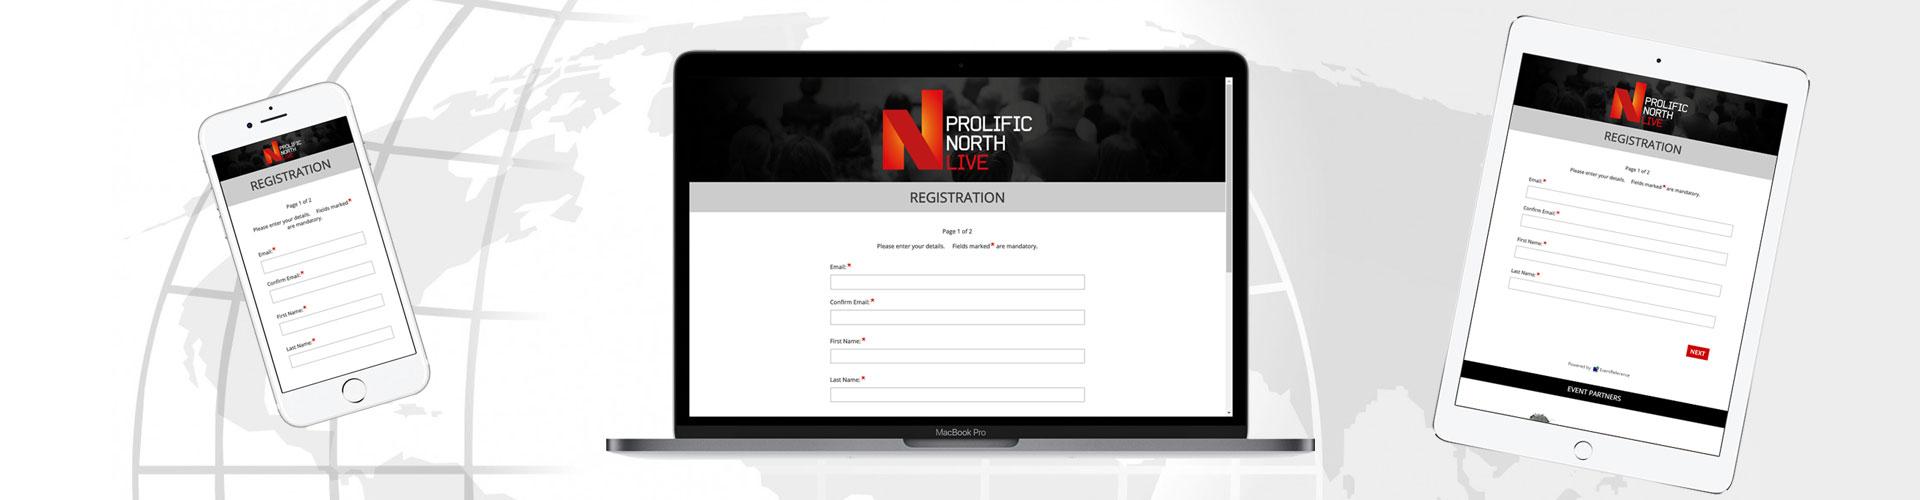 Online event registration and badging | RefTech